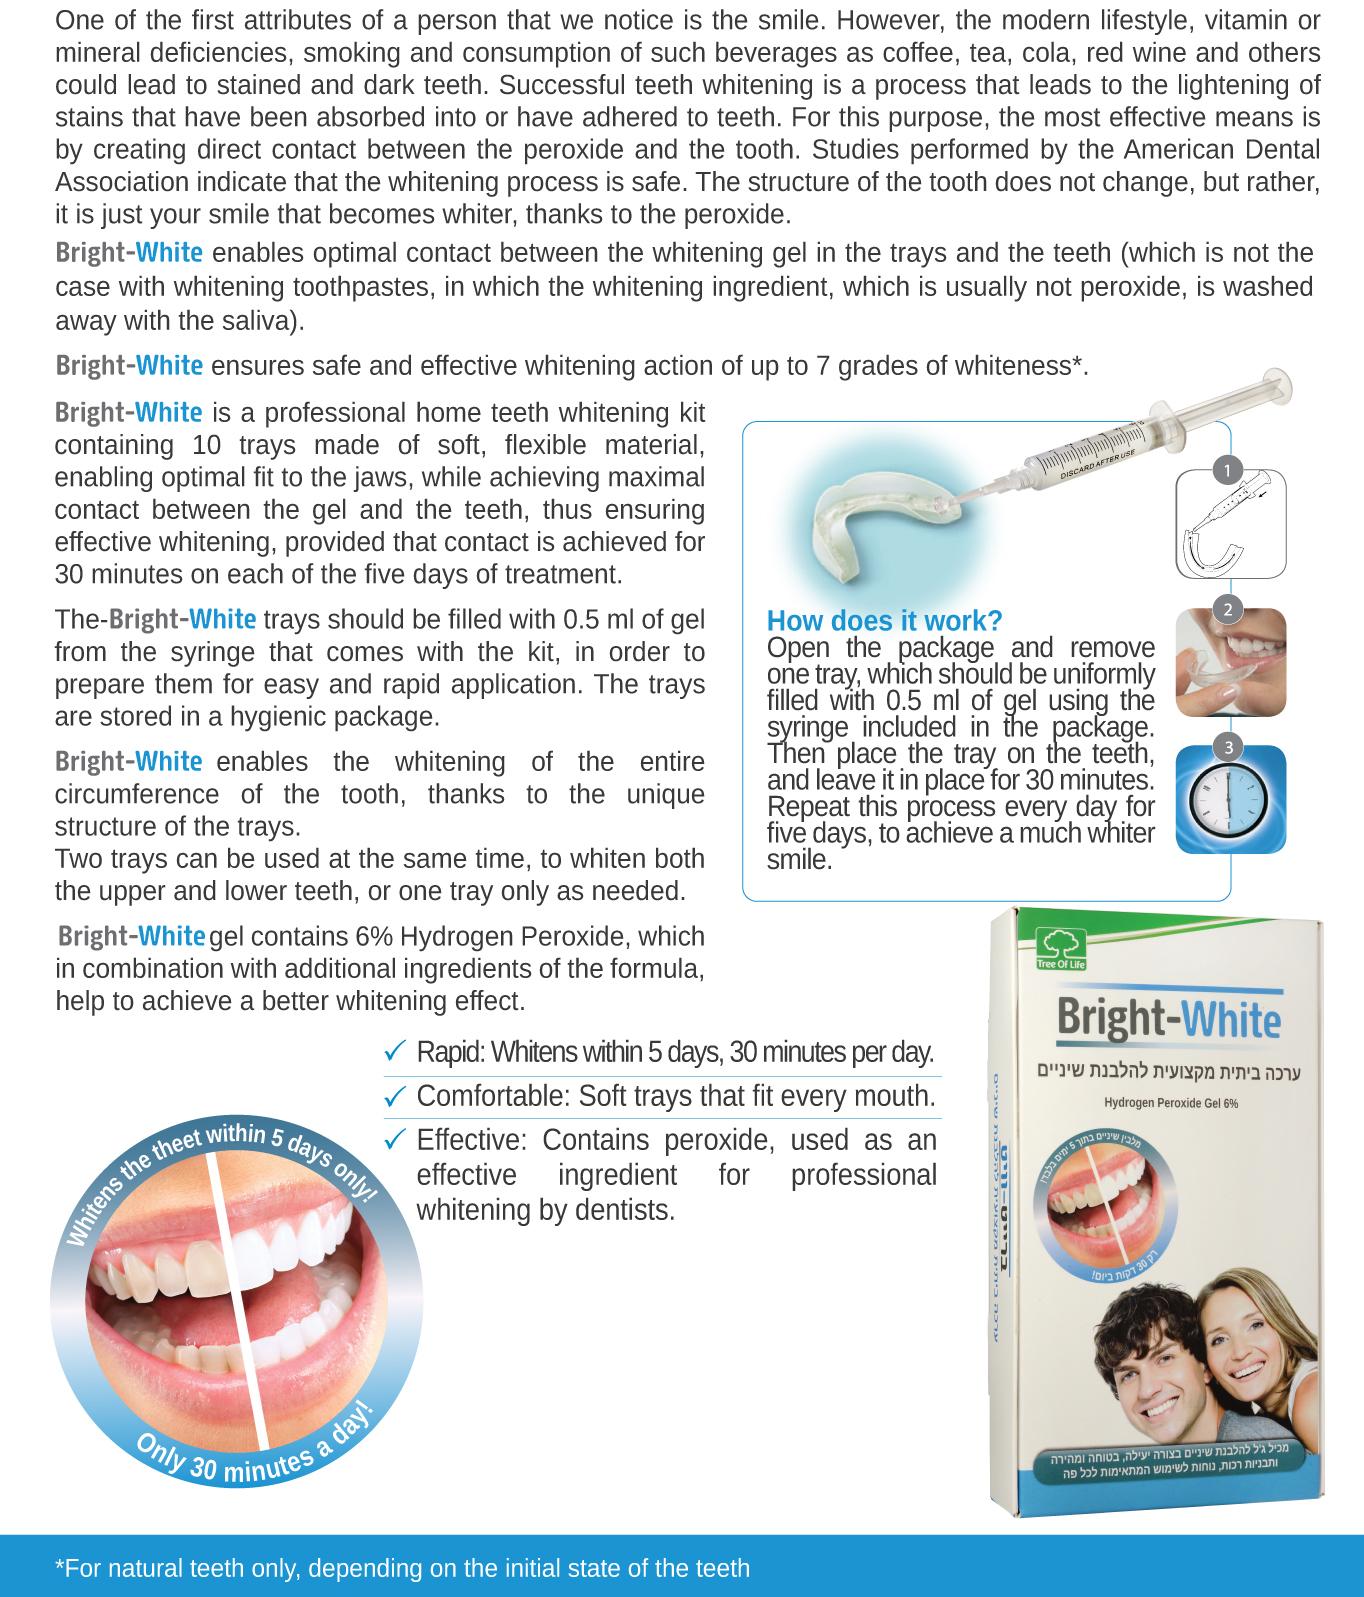 Bright White - Teeth whitening kit